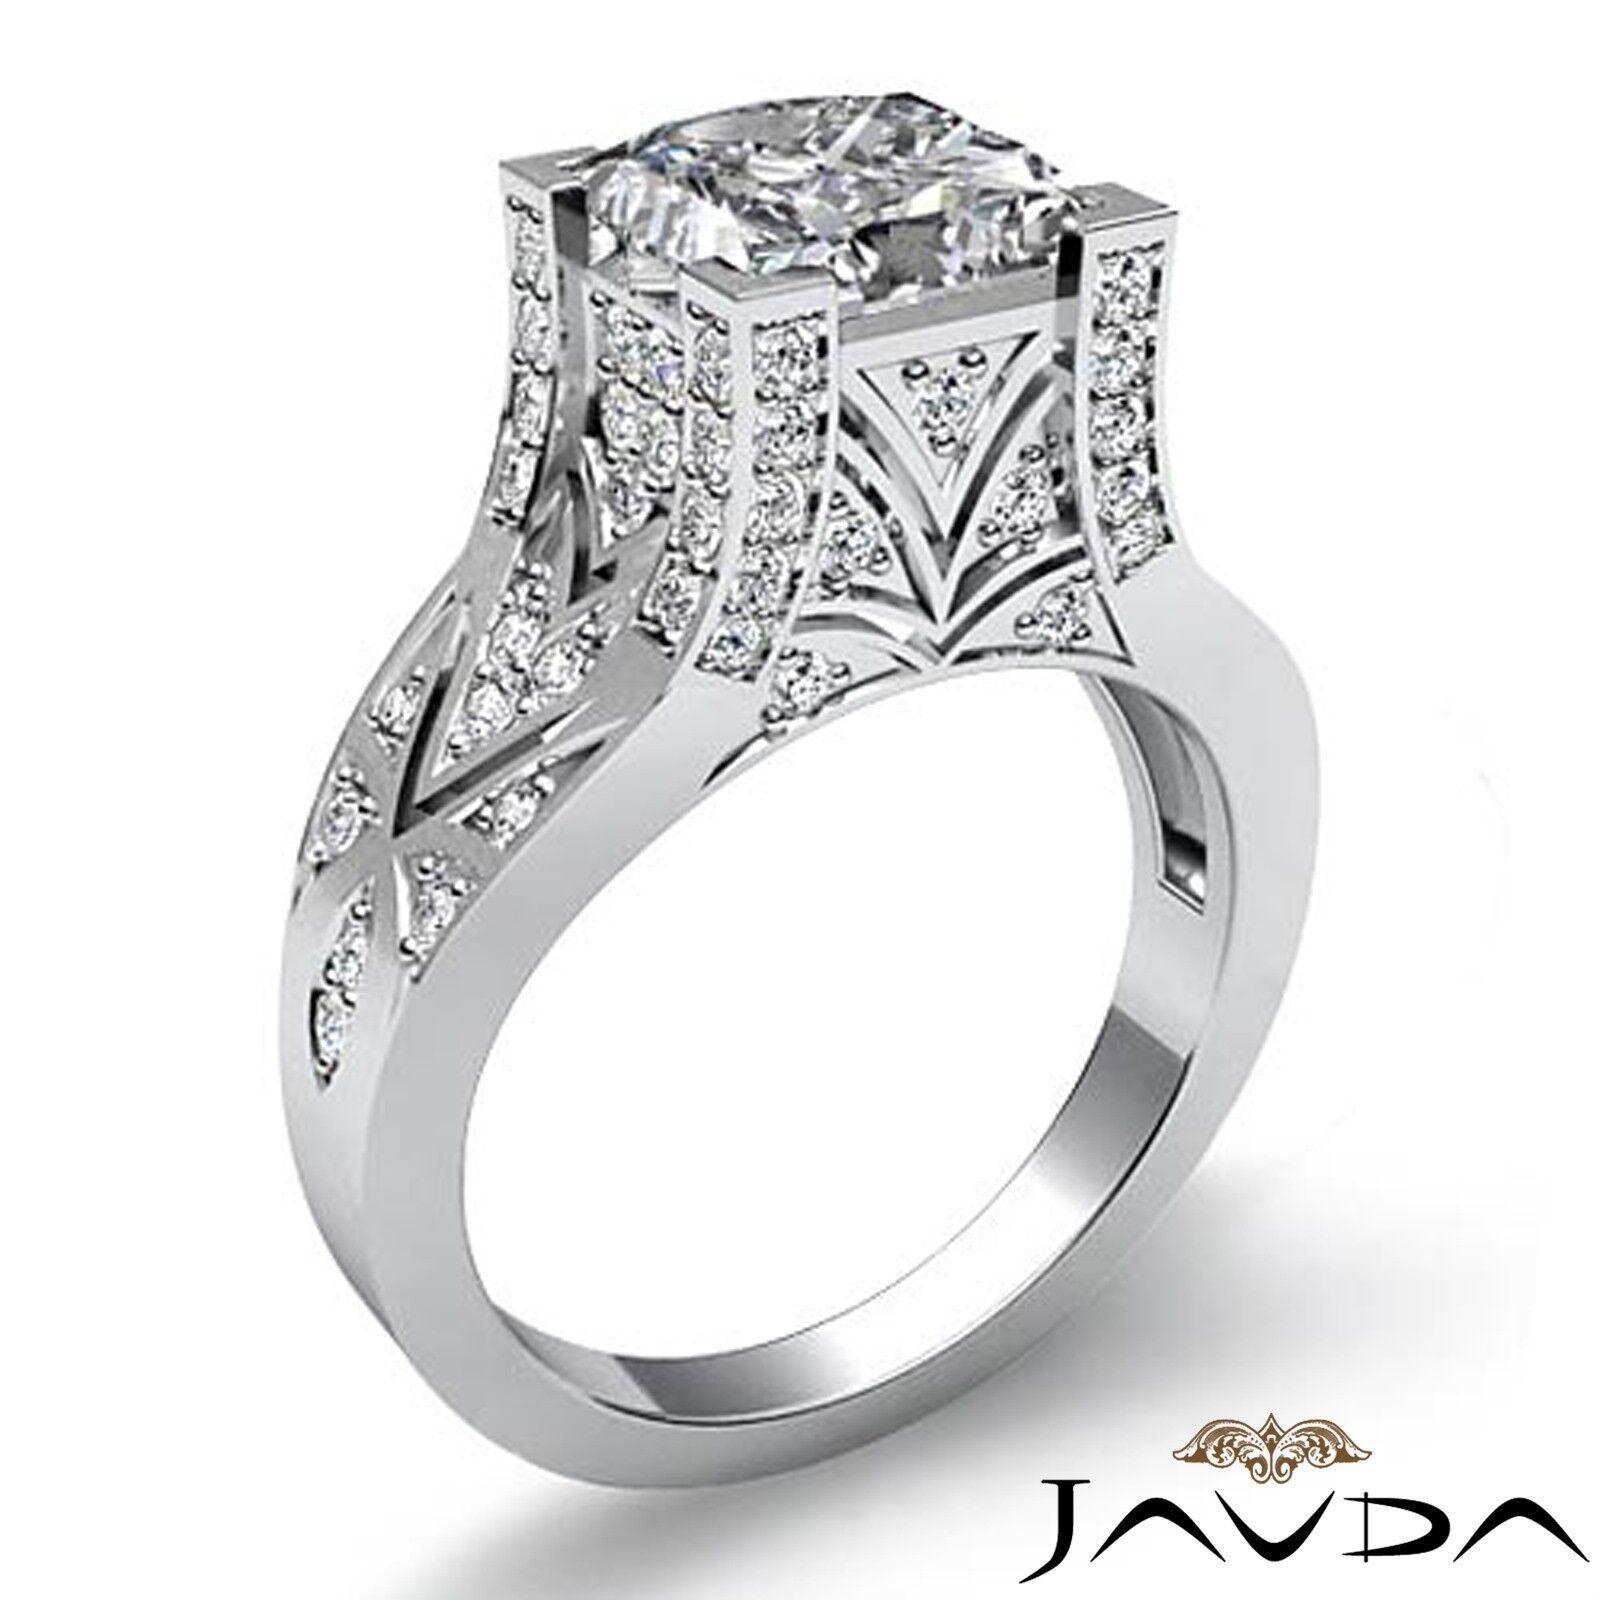 1.5ctw Antique Pave Princess Diamond  Engagement Ring GIA F-VS1 White Gold 1